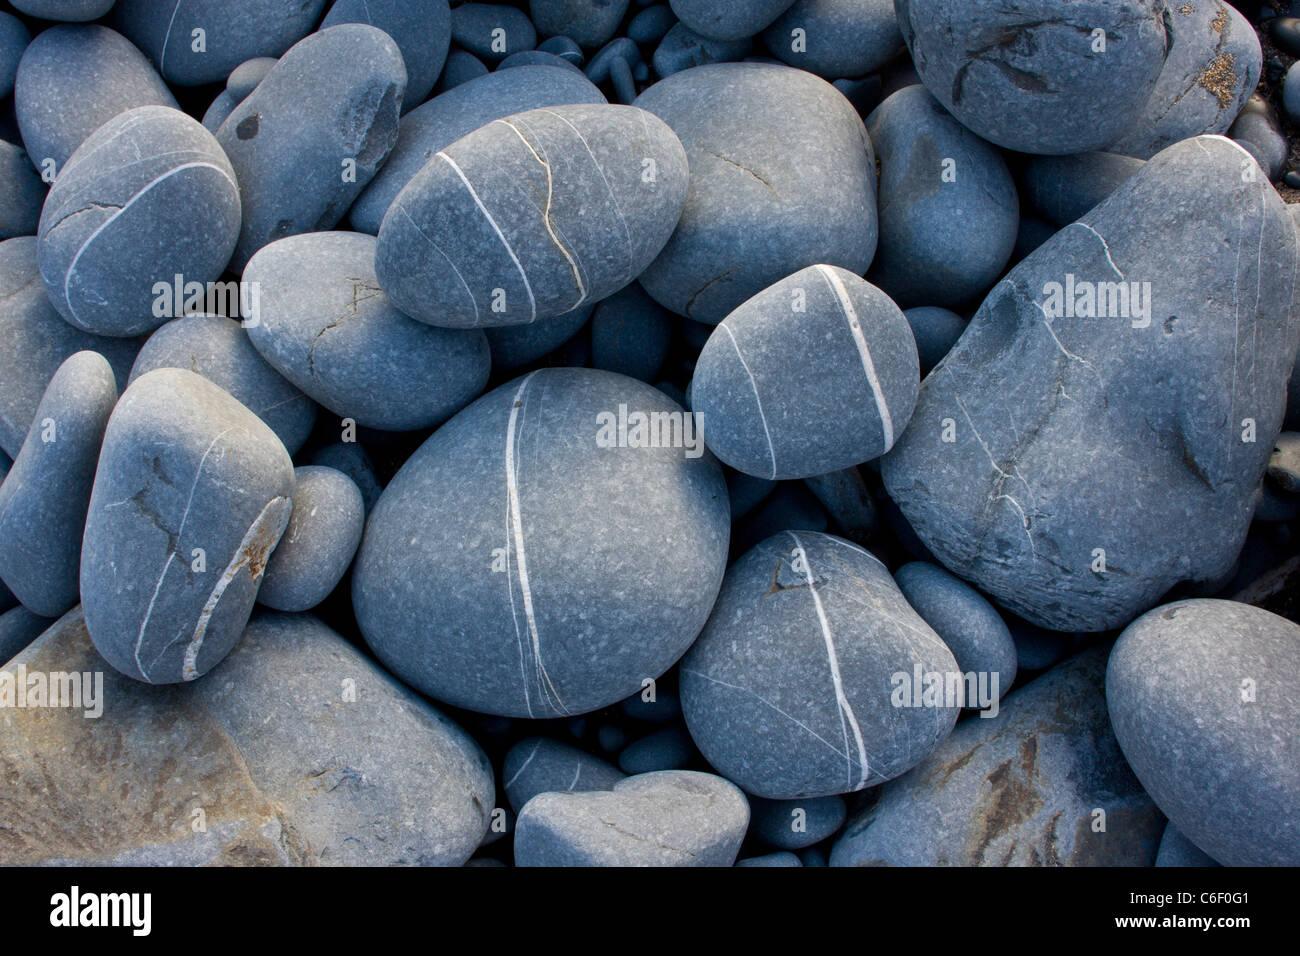 Rounded sandstone beach pebbles at Hartland Quay, north Devon. - Stock Image